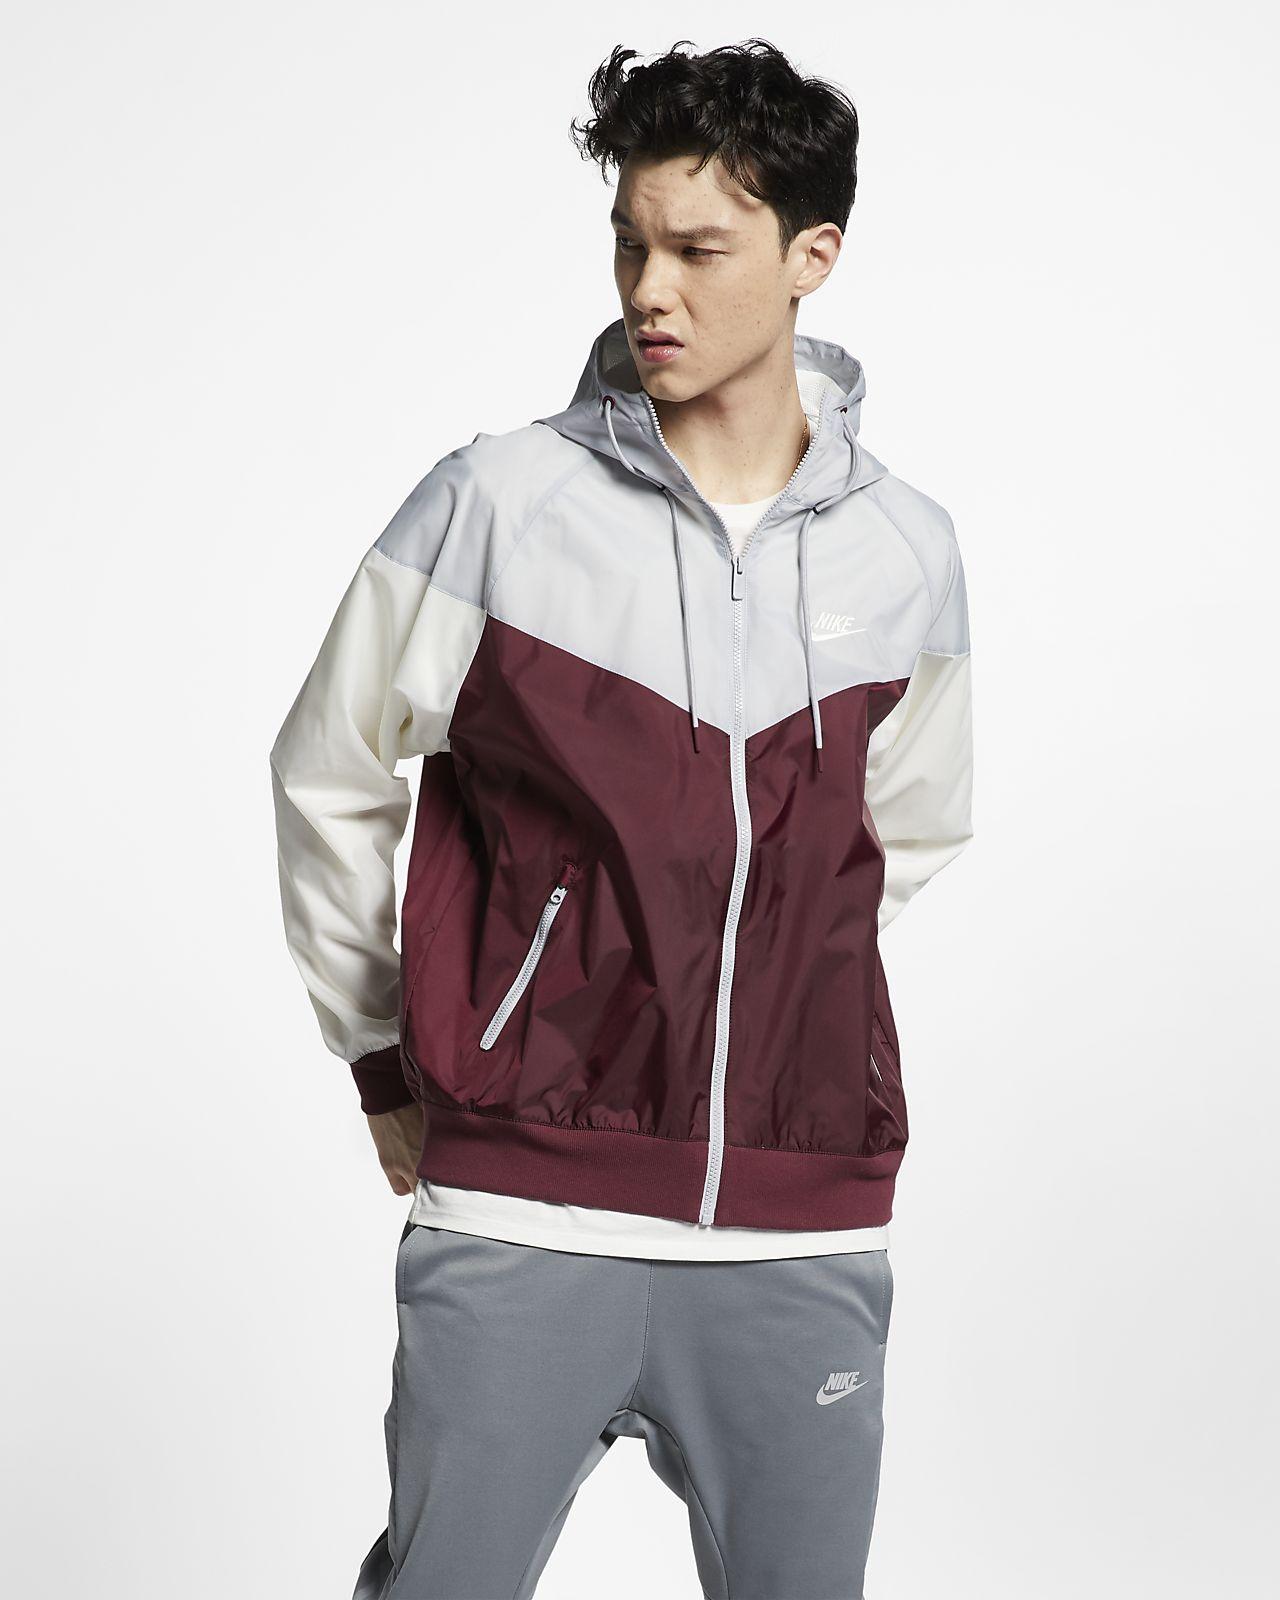 Vent Nike Coupe À Pour Homme Sportswear Capuche Fr Windrunner Xqixya VqSMUzp